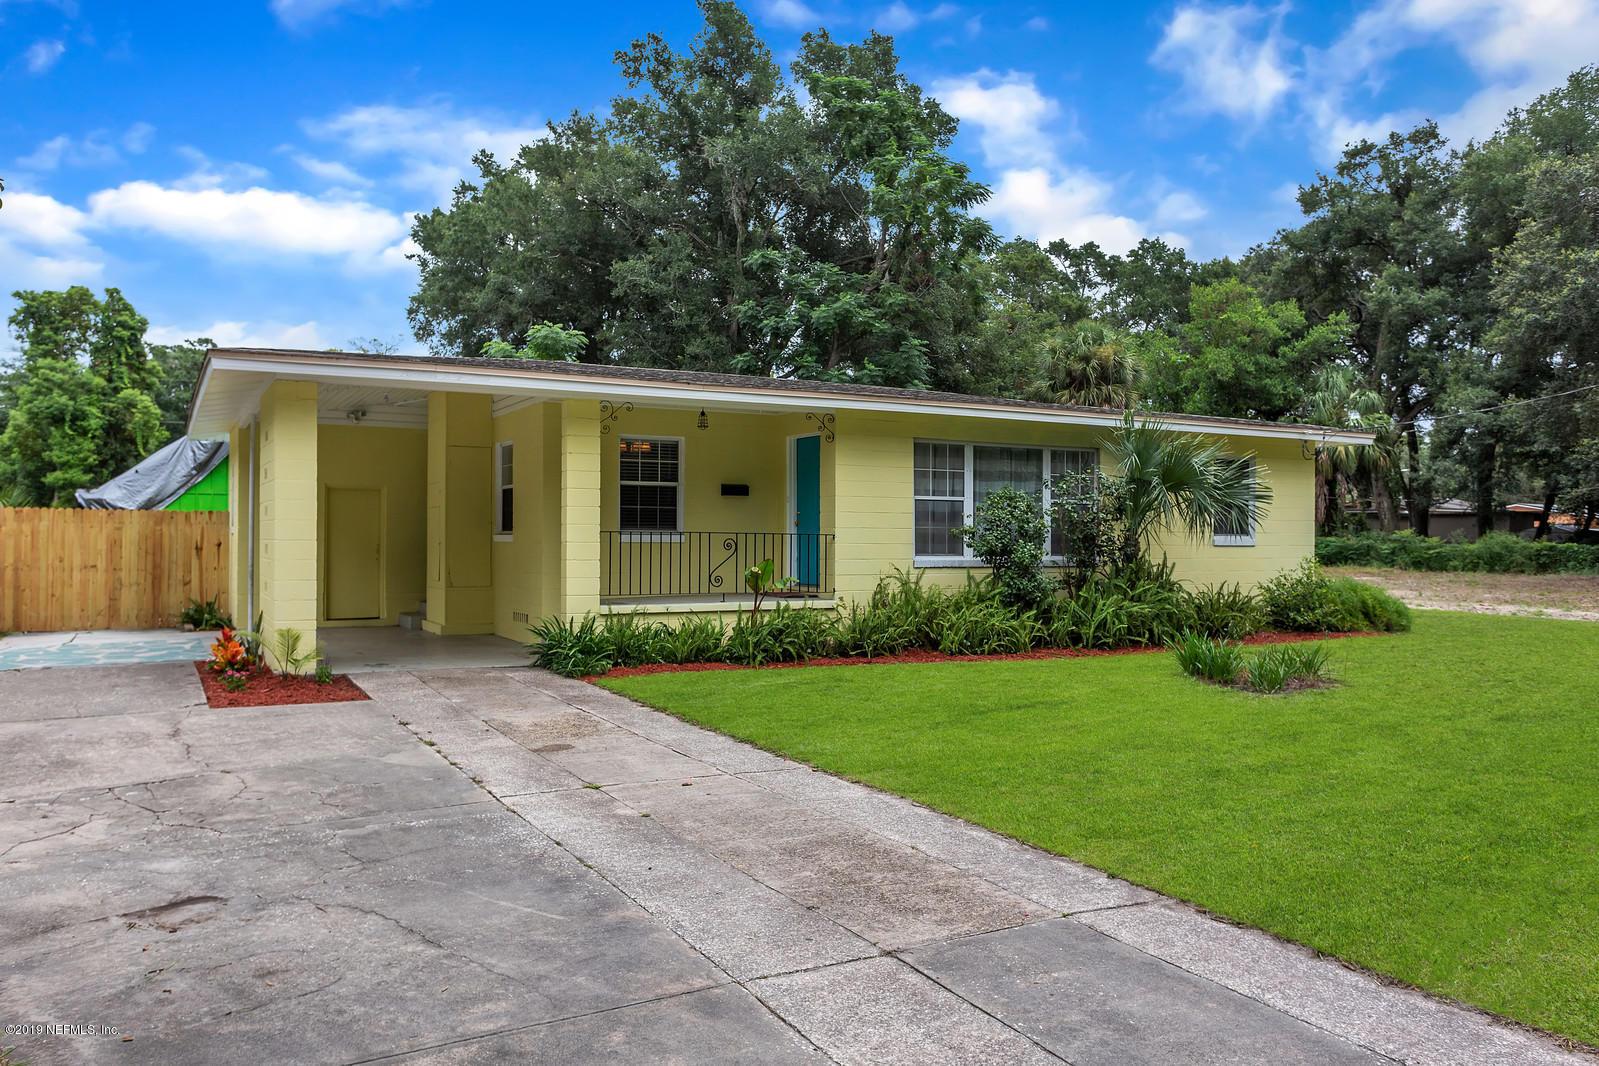 1943 Paine Ave Jacksonville, FL 32211